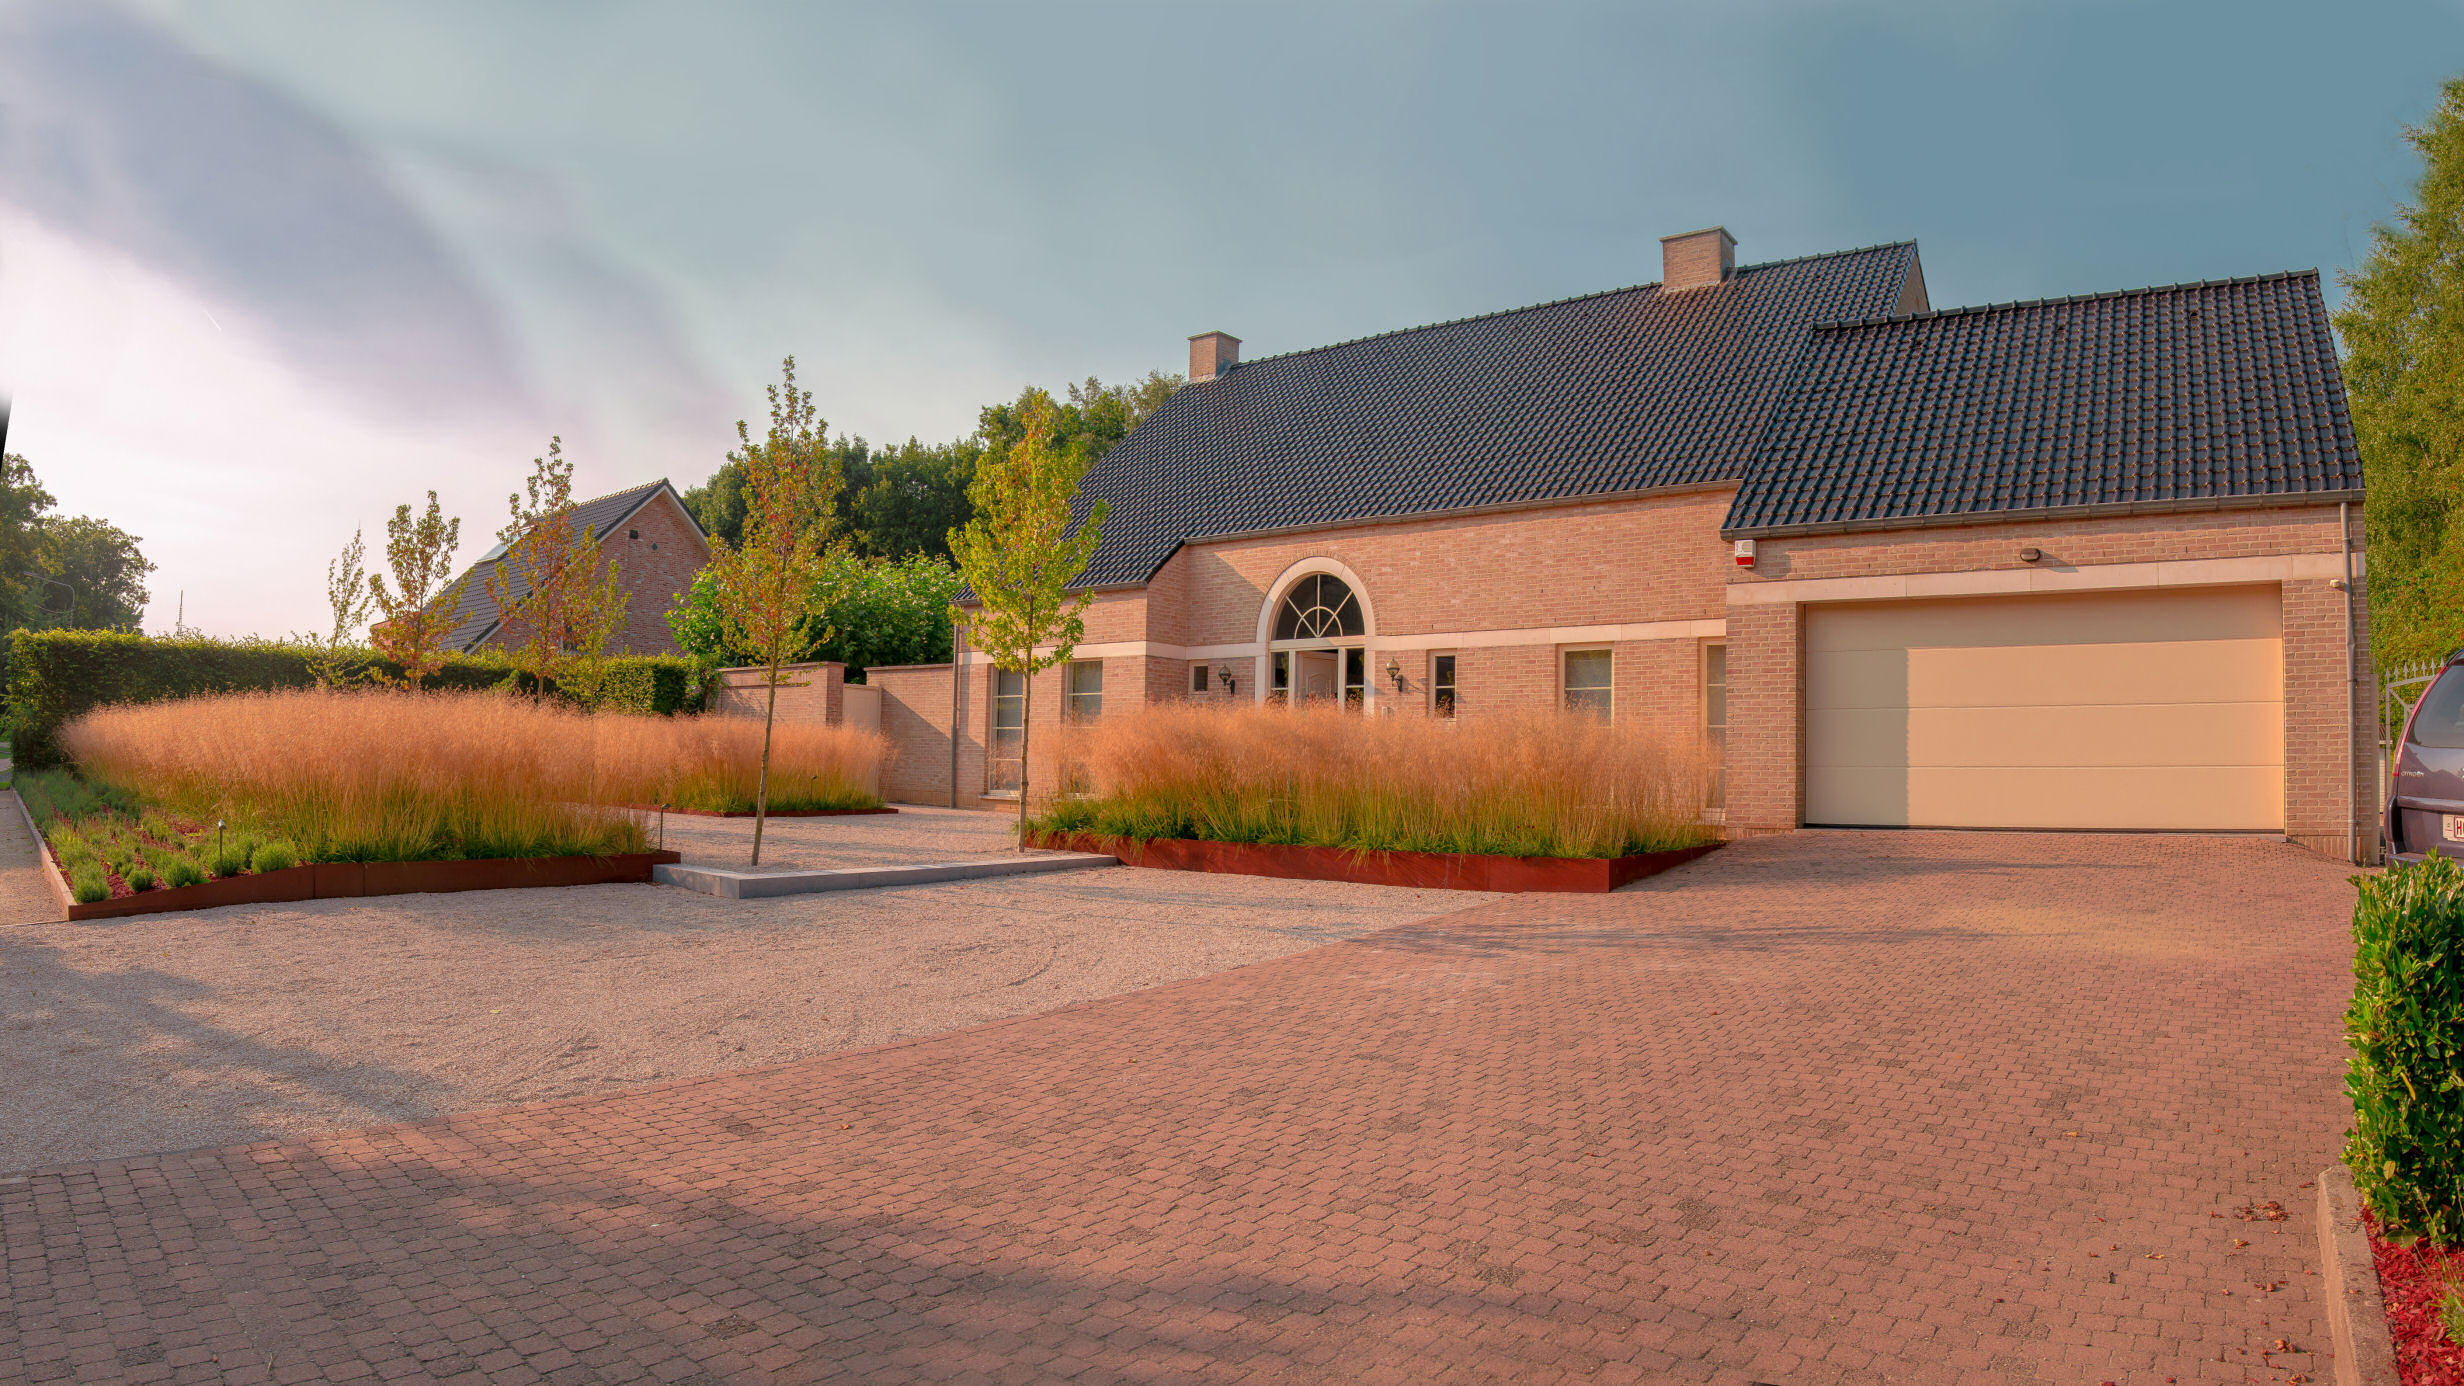 tuinarchitectuur, cortenstaal, tuinontwerp, grassentuin, tijdloos